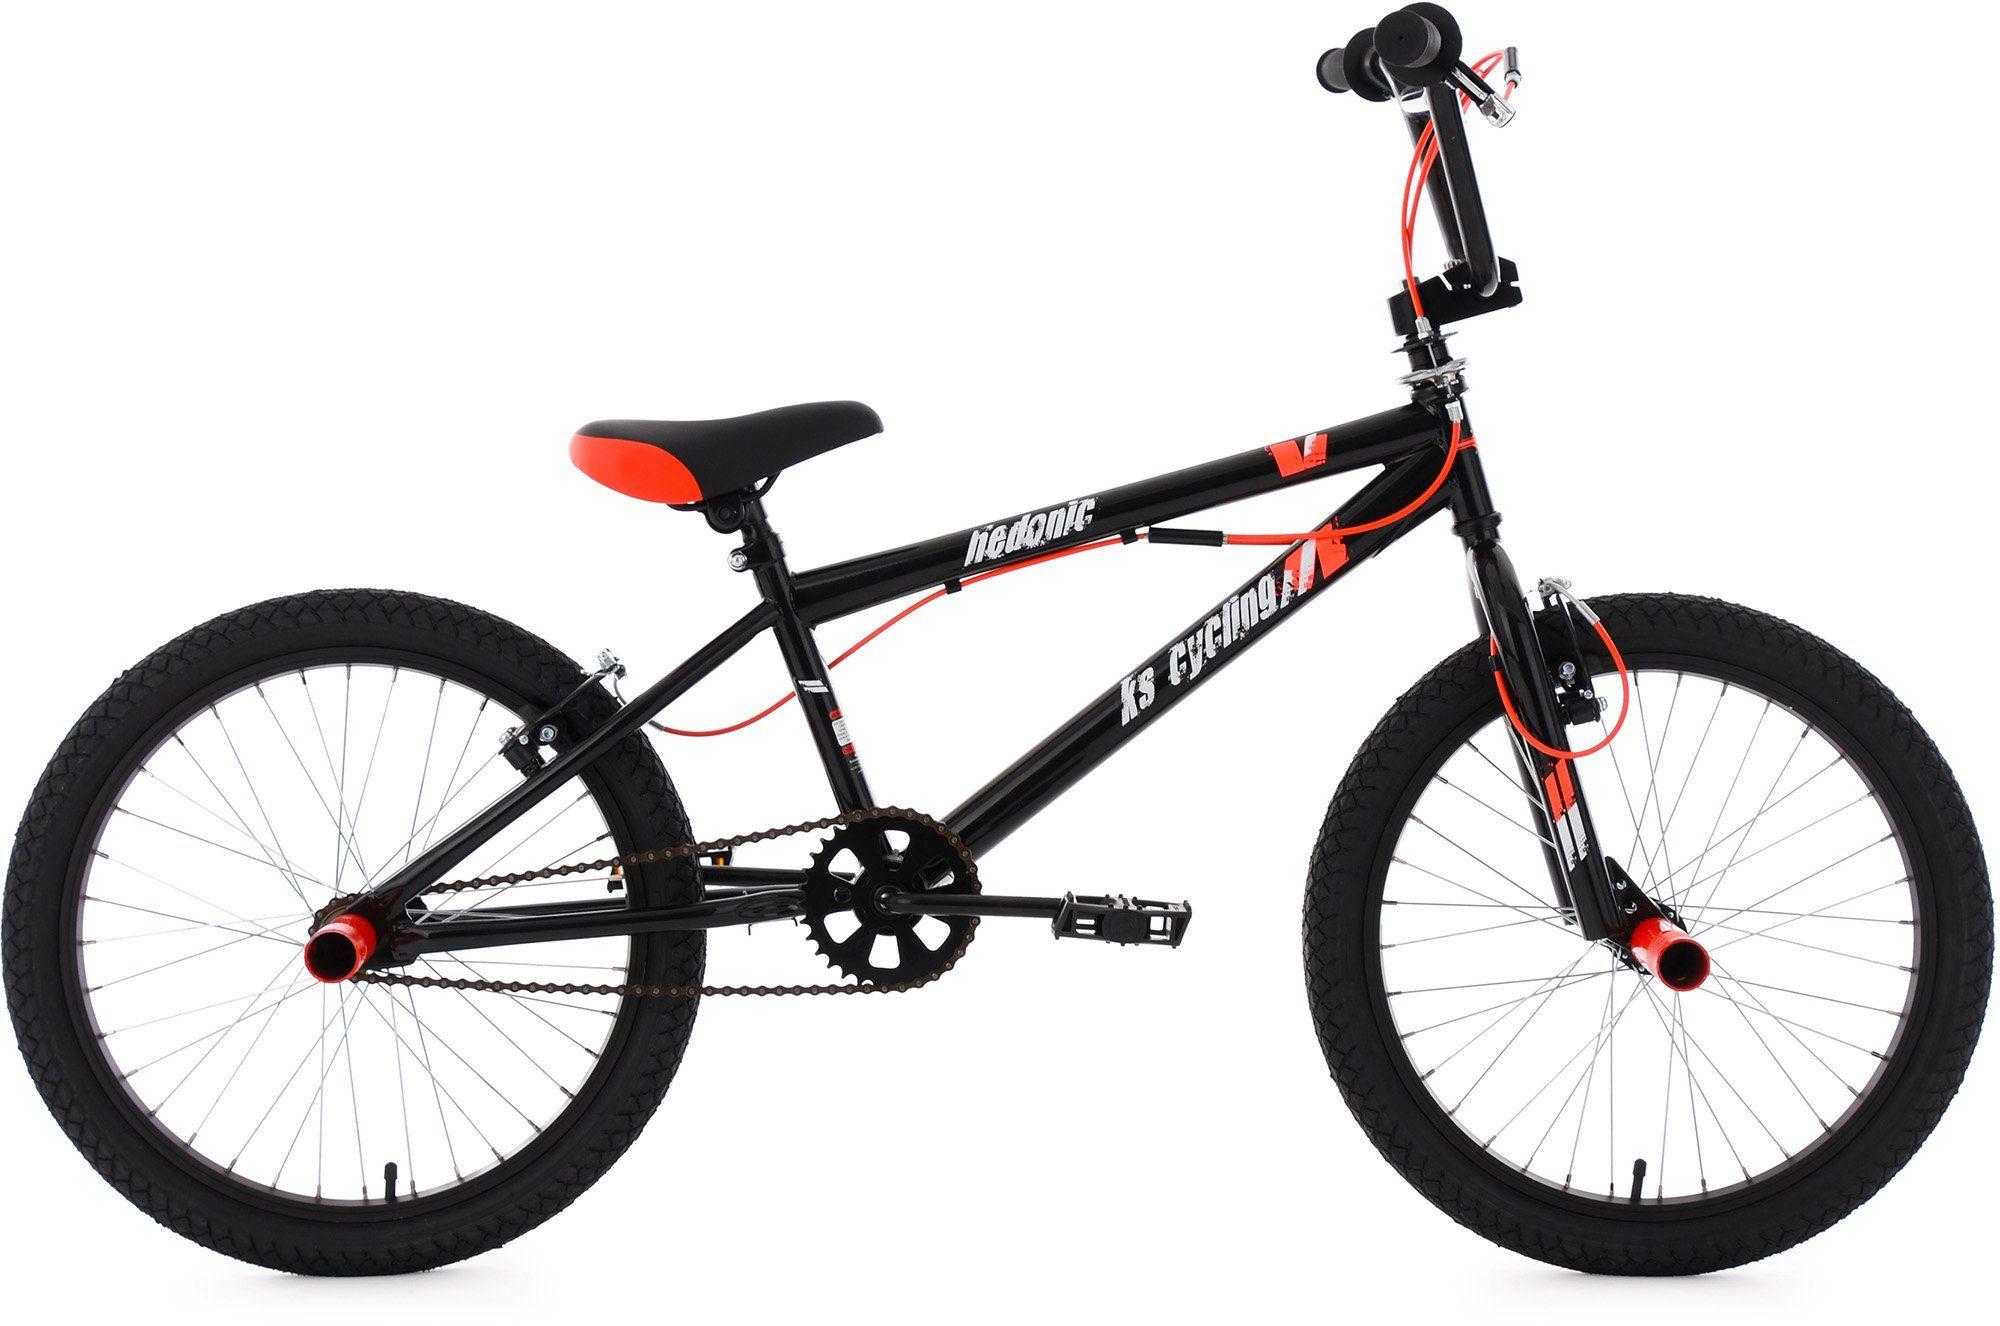 KS Cycling BMX Fahrrad, 20 Zoll, schwarz-rot, »Hedonic«